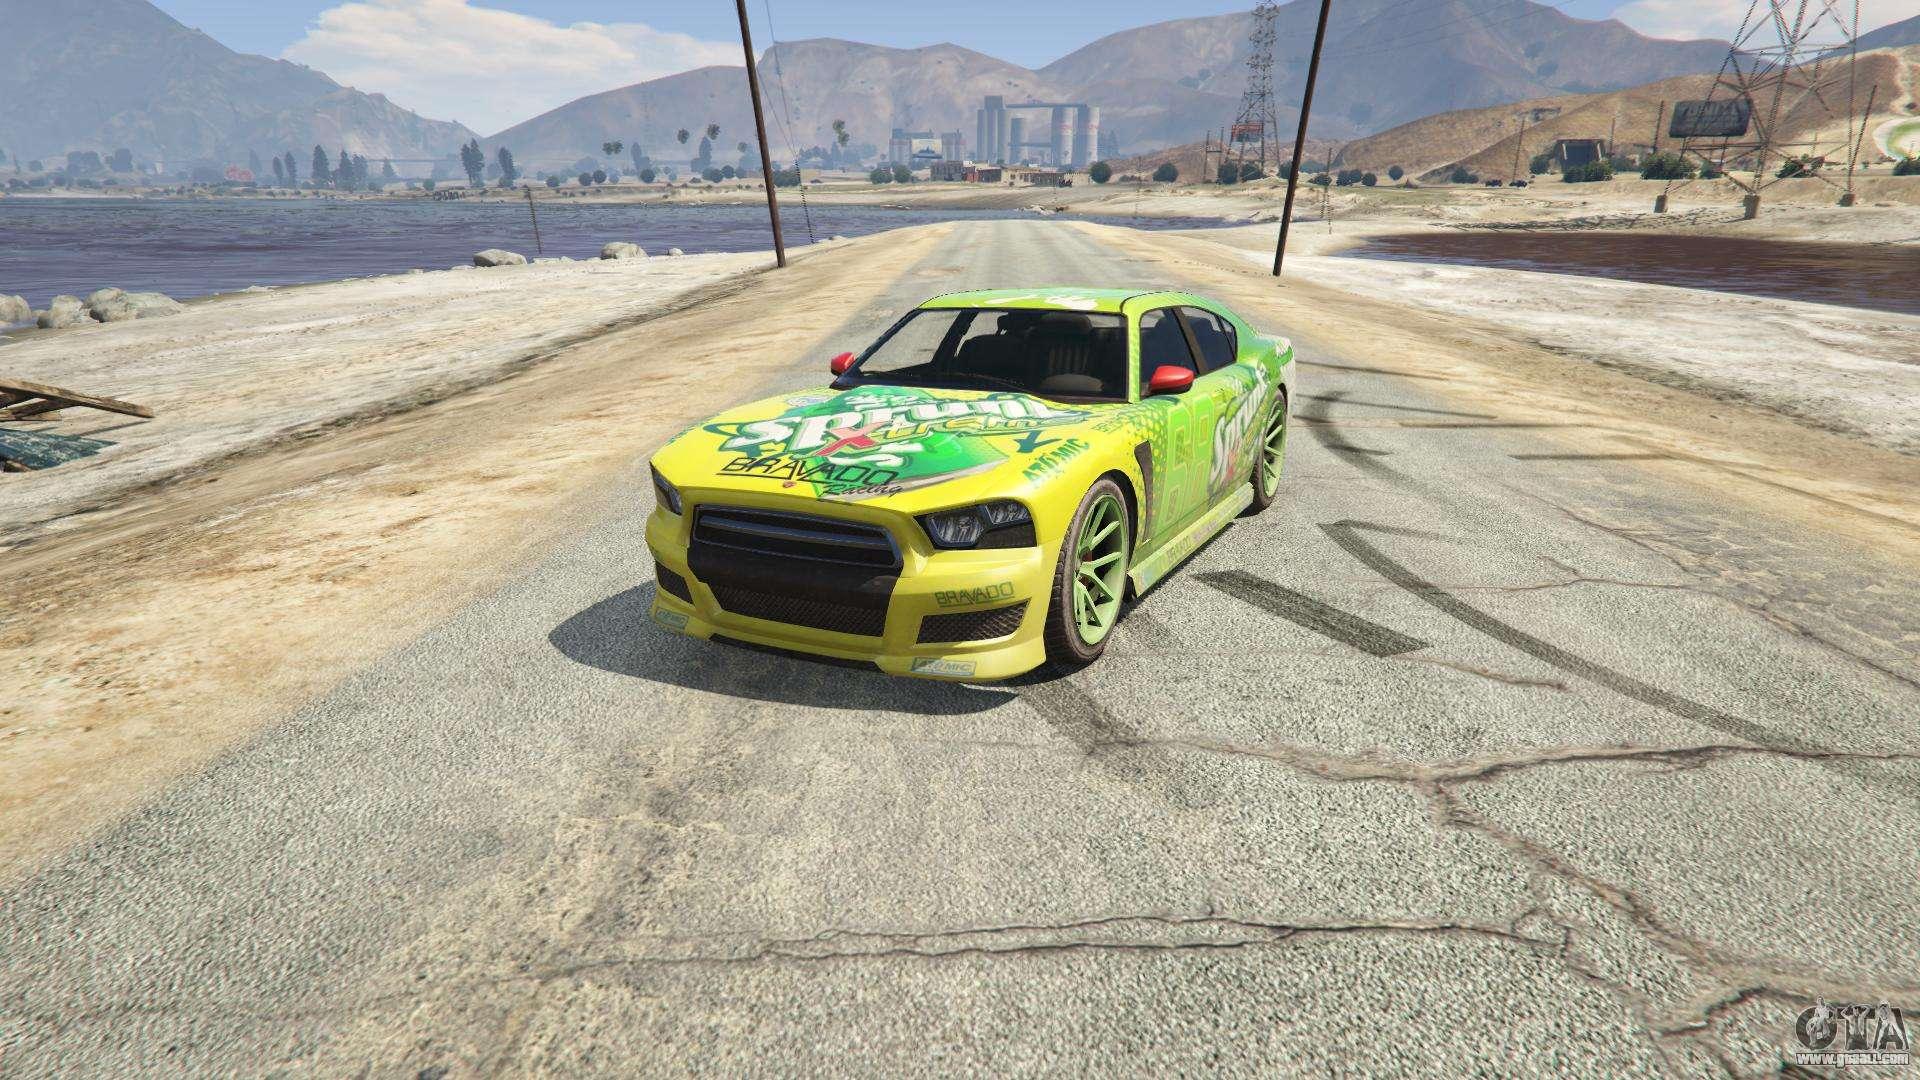 Sprunk Buffalo S GTA 5 - front view